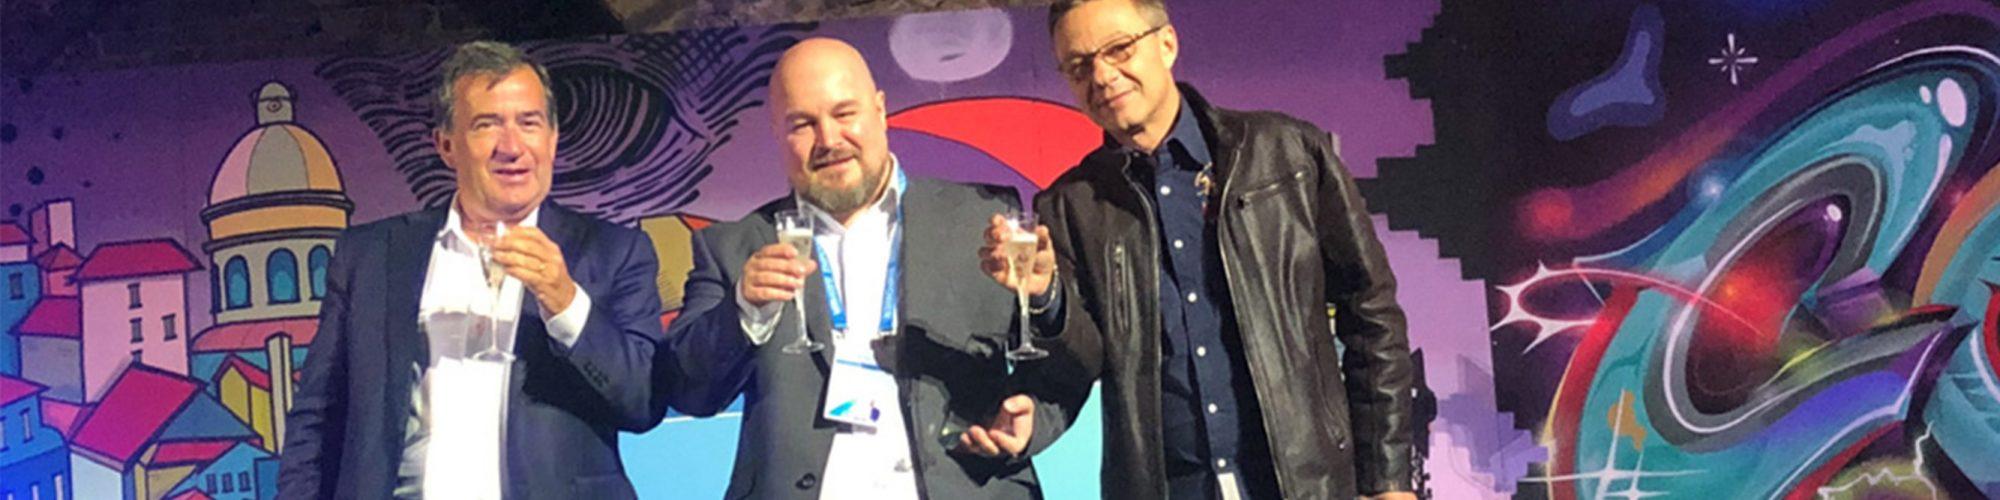 VMware NEMEA Digital Transformation Success Story of the Year